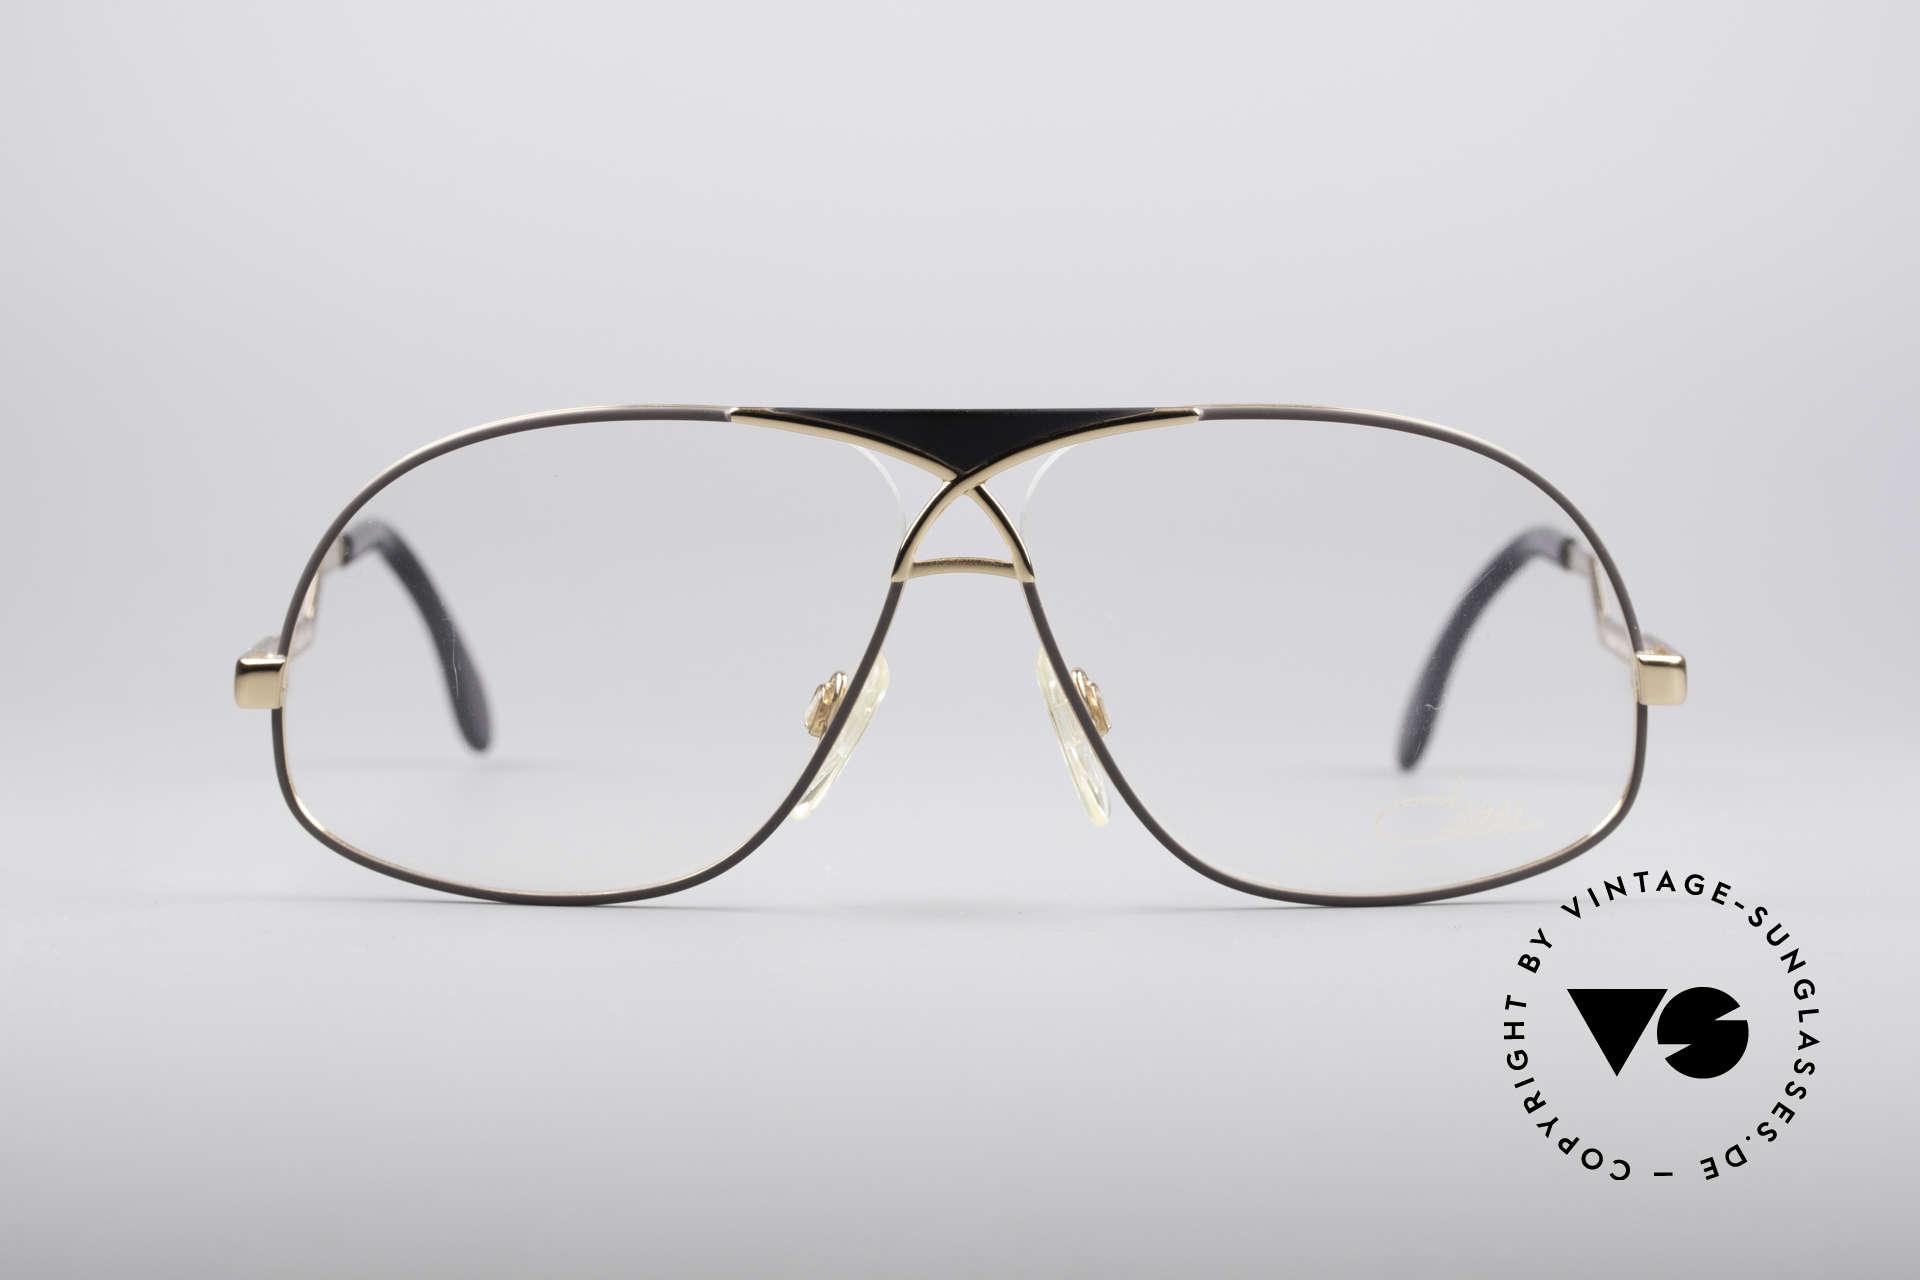 d3189181c68b Glasses Cazal 737 80 s vintage Men s Glasses